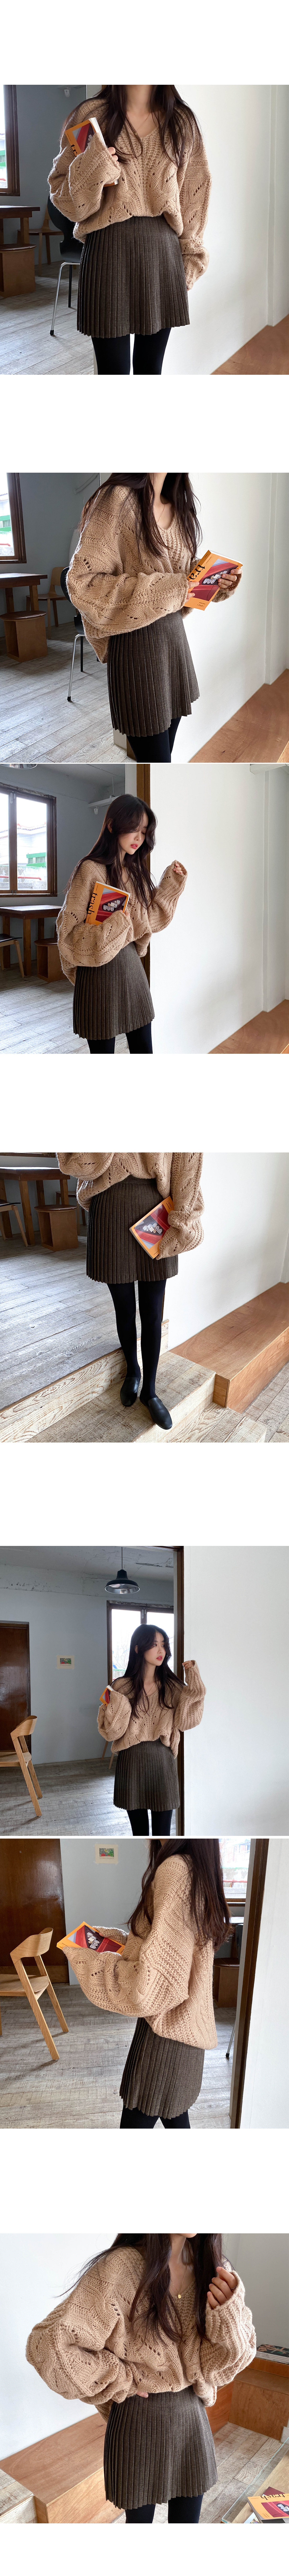 Louis checkpleats miniskirt